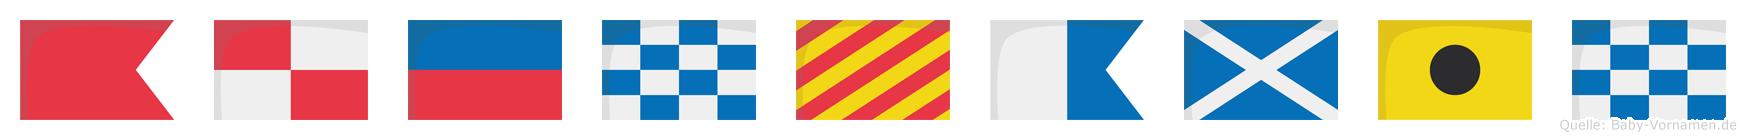 Bünyamin im Flaggenalphabet